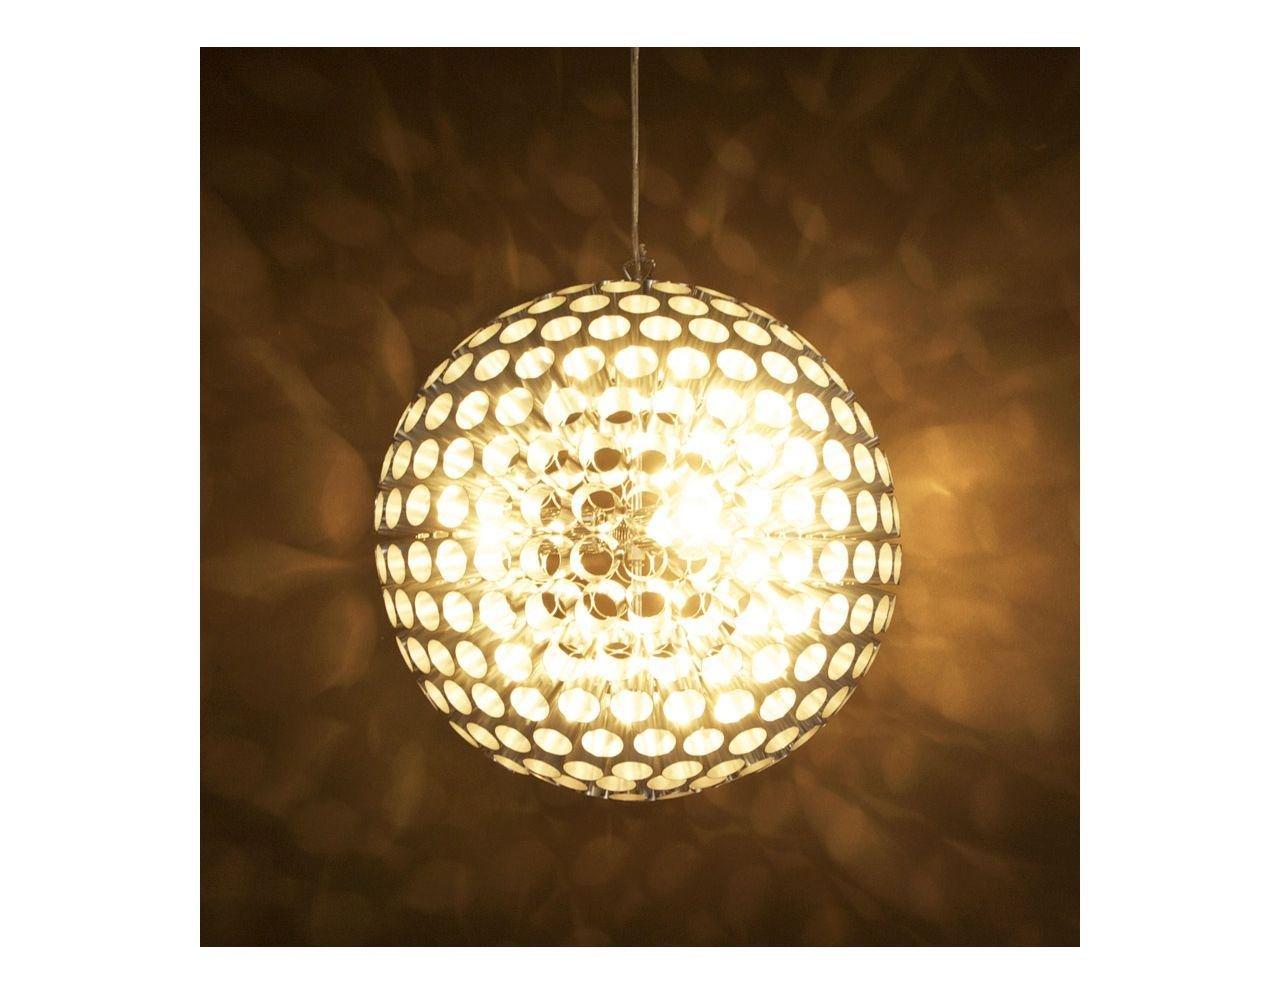 Lampenschirm aus Aluminium-Kokoon Design